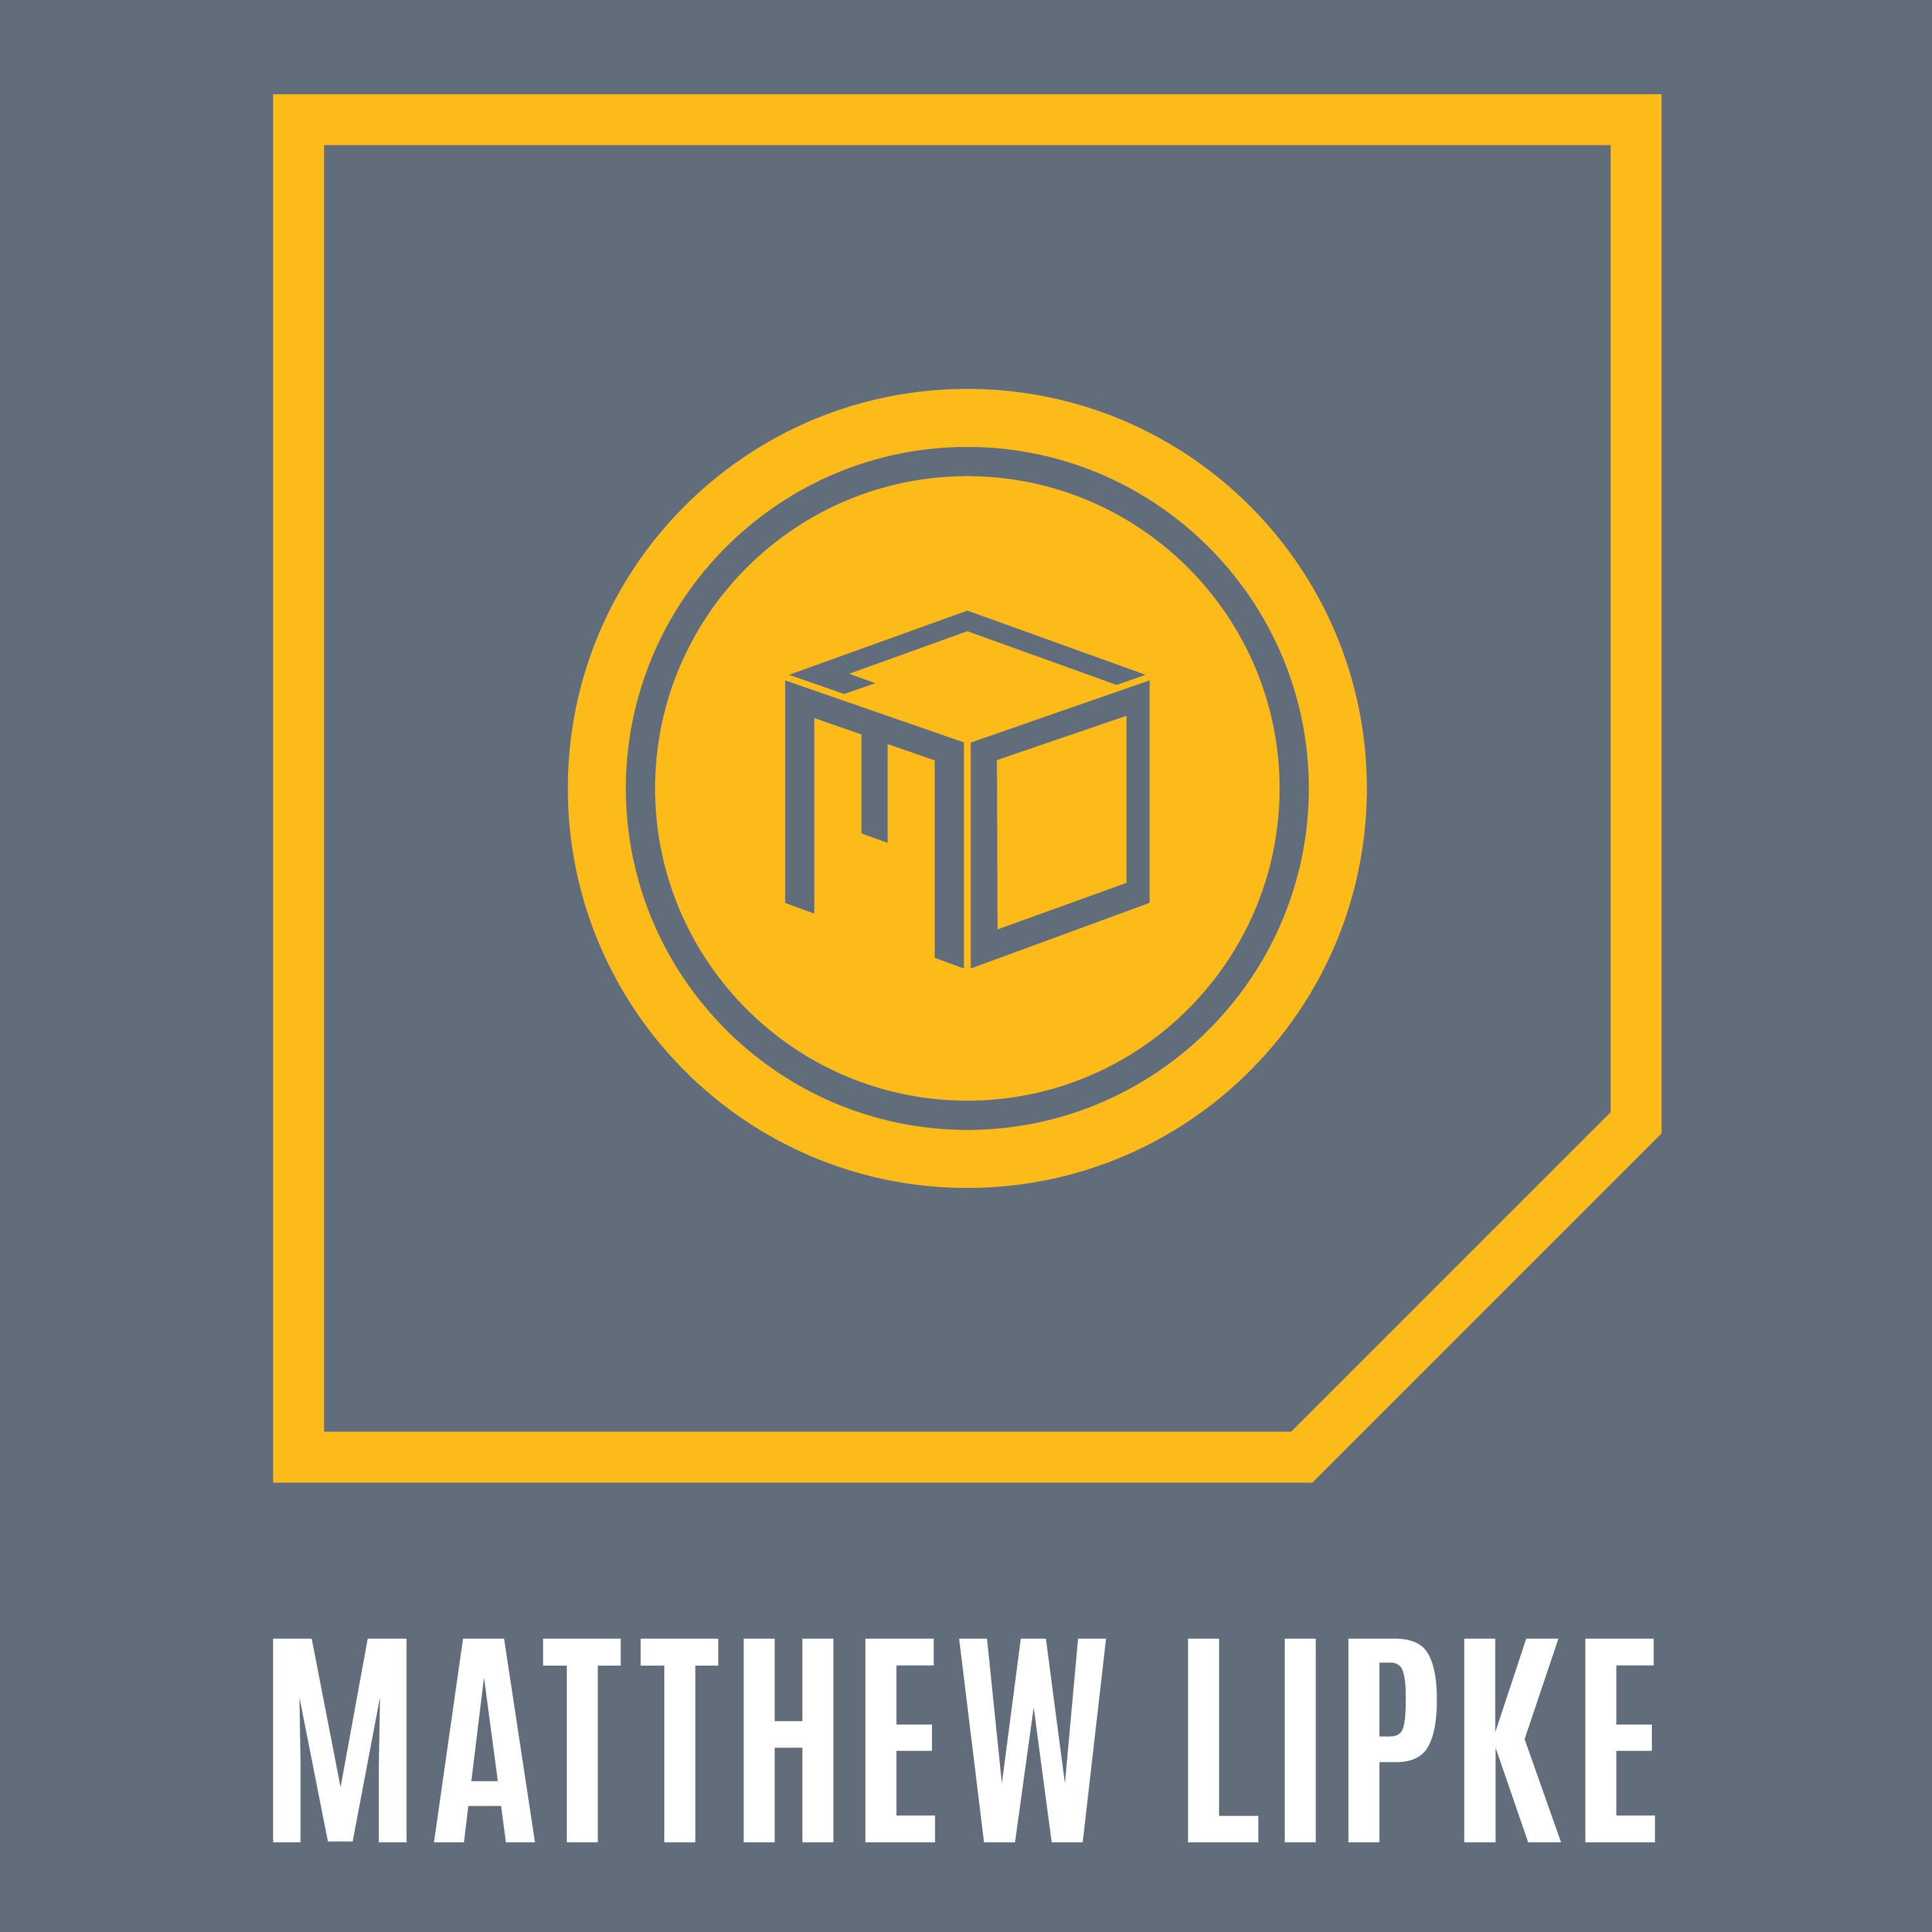 Matthew Lipke